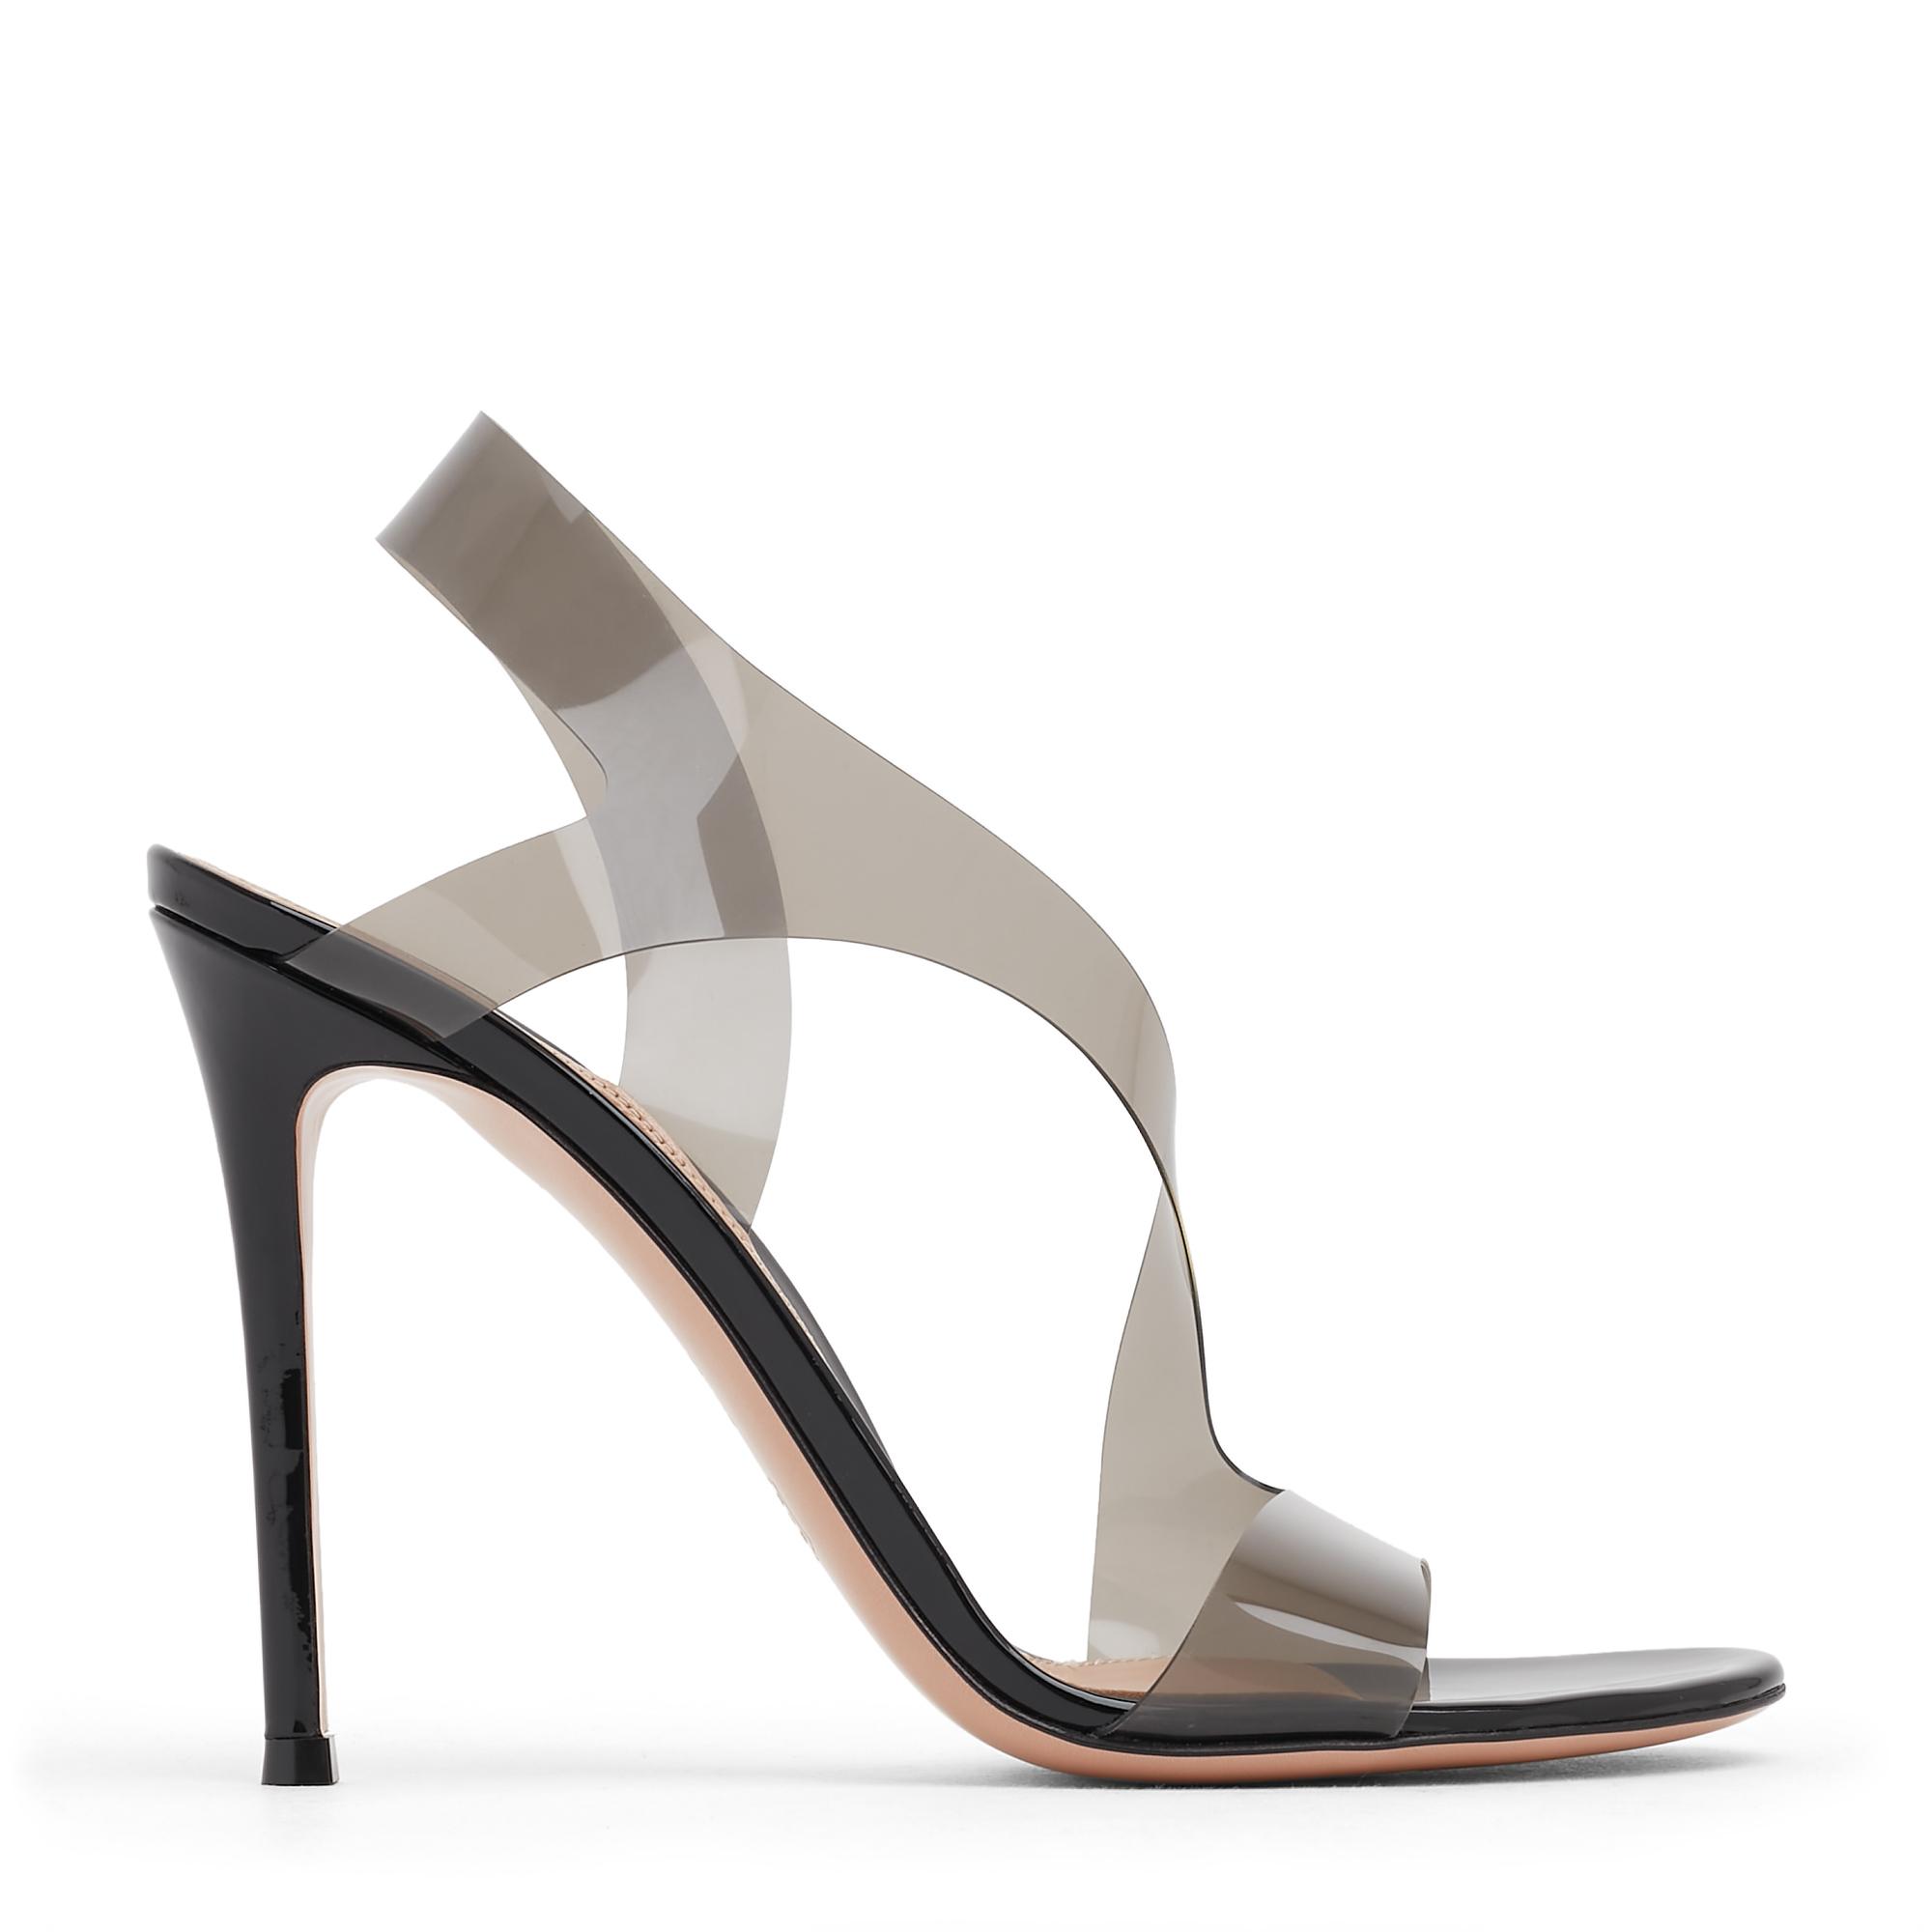 PVC high-heel sandals